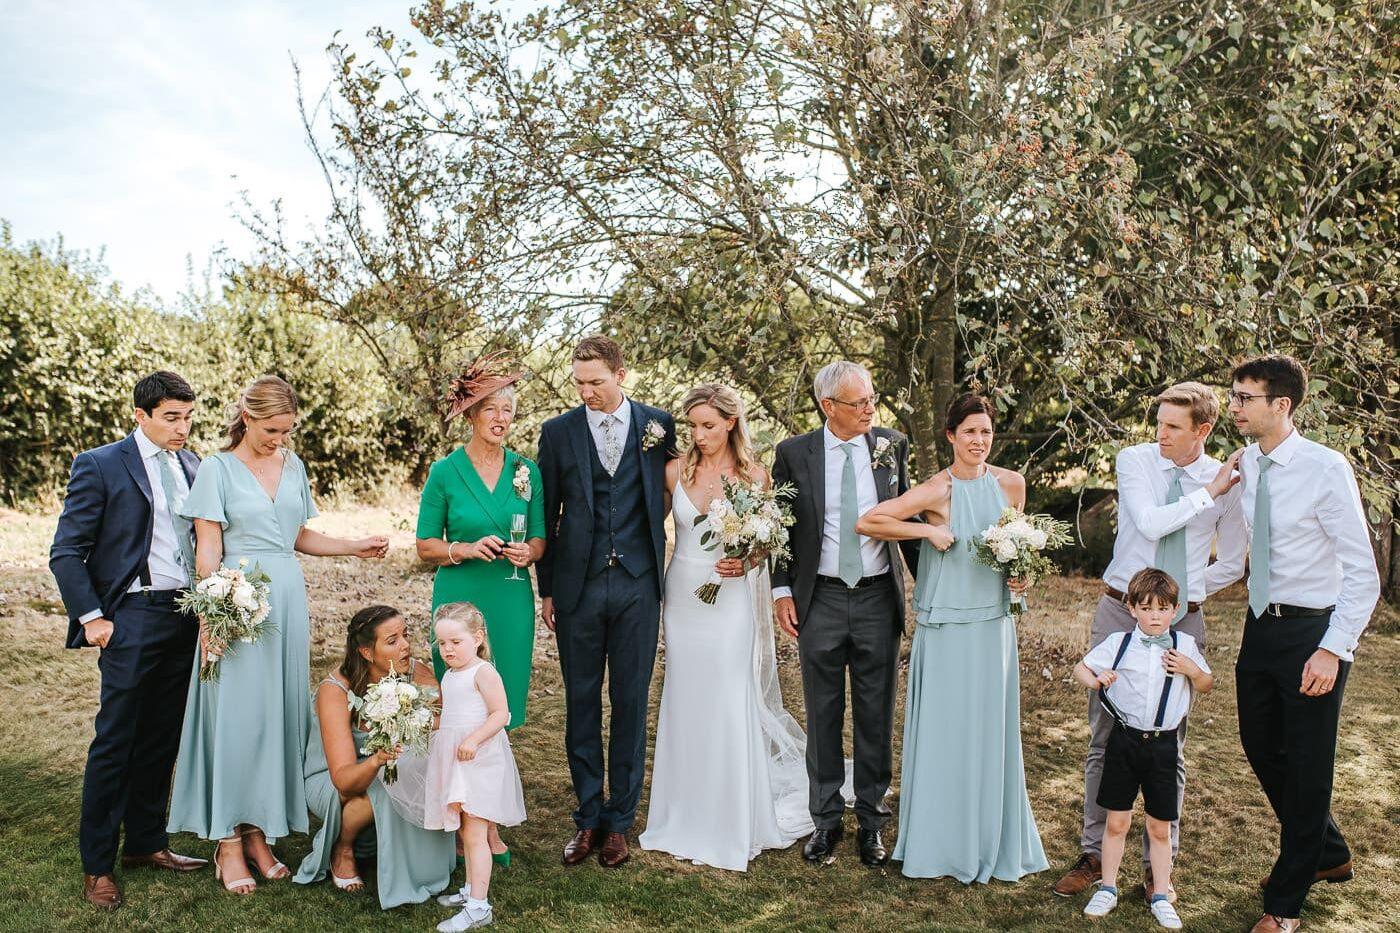 Stokes Farm Barn Wedding|Wedding Photographer Berkshire 1